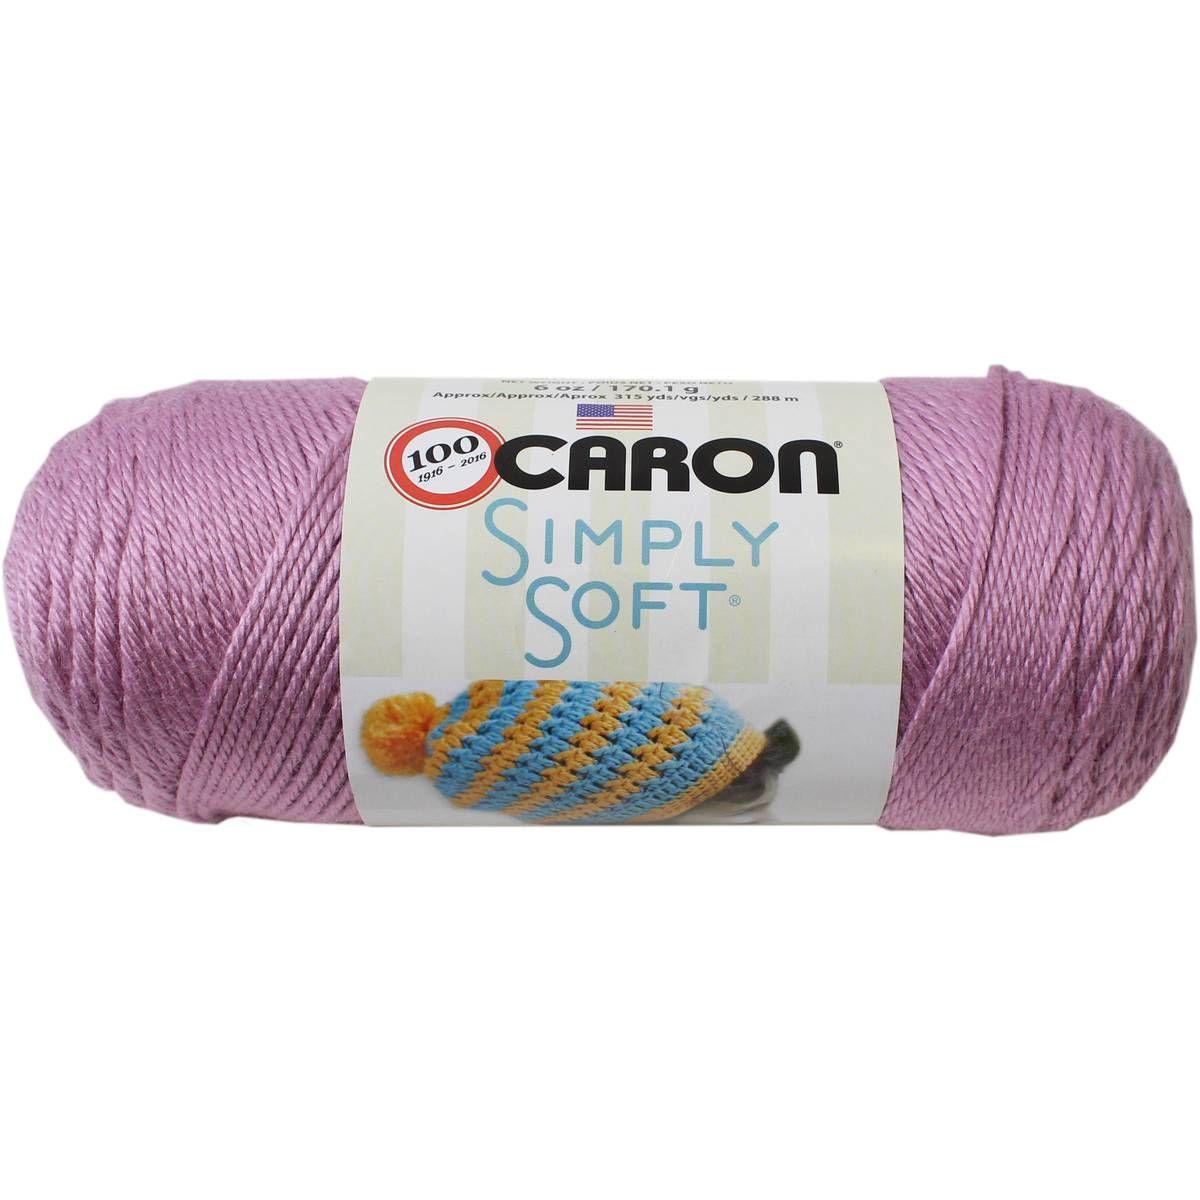 Ideas Hobbycraft Blog Caron Simply Soft Hobbies And Crafts Wool Yarn